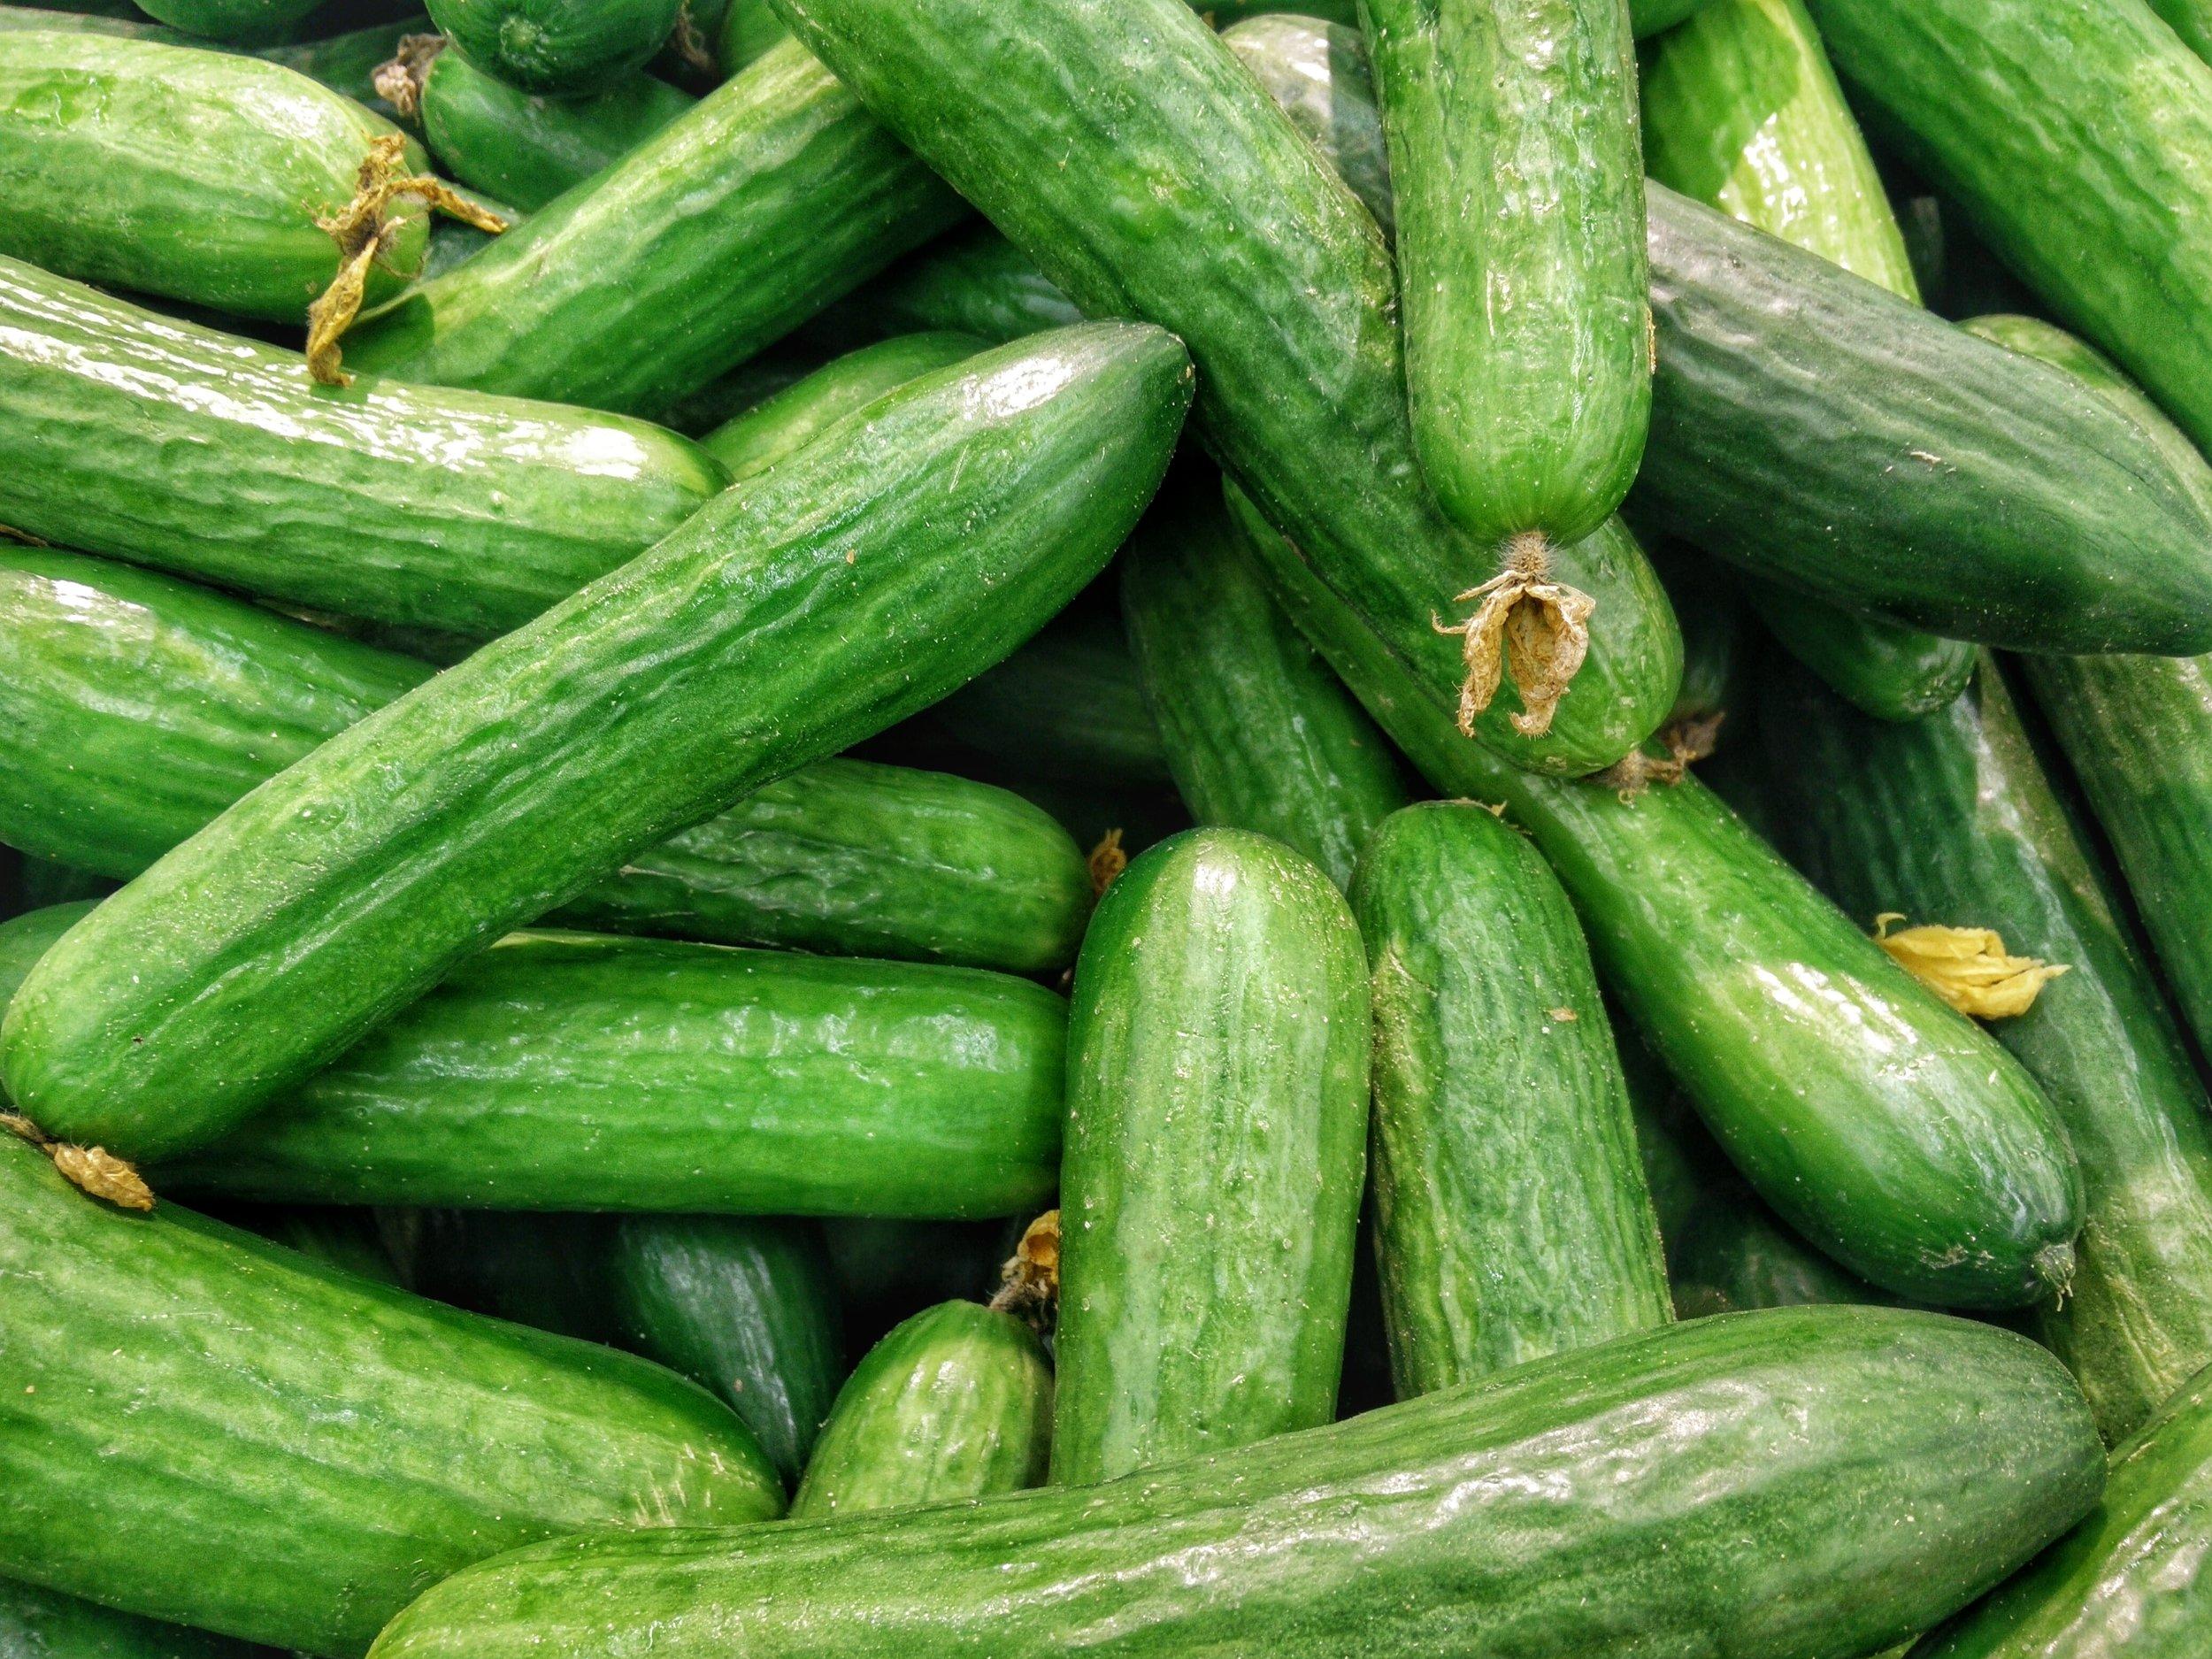 cucumbers-delicious-food-1656664.jpg